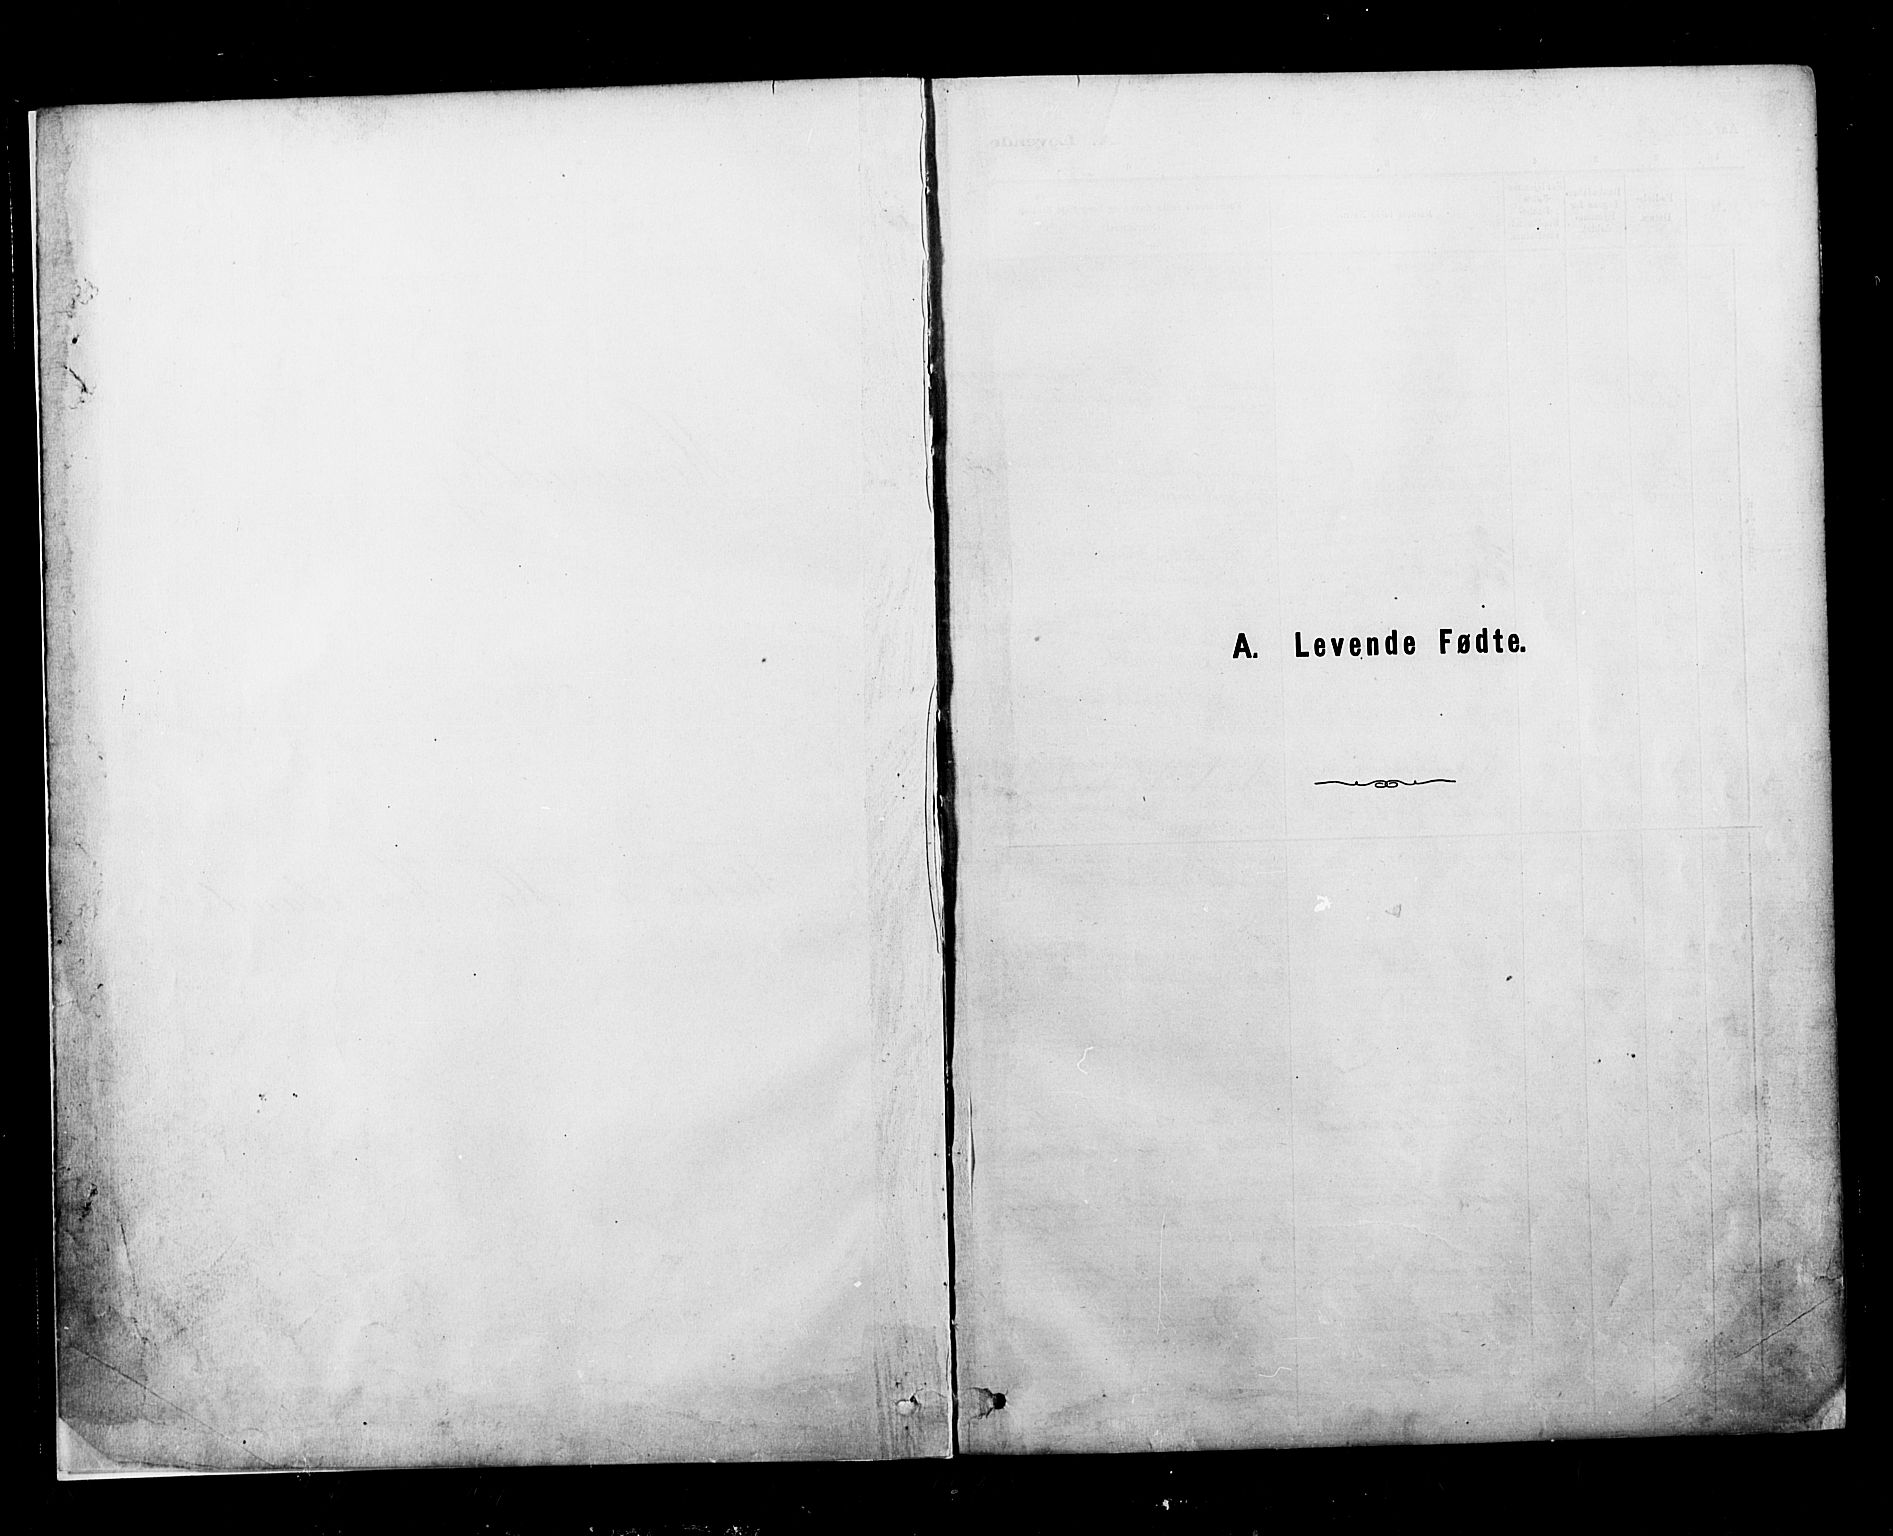 SAT, Ministerialprotokoller, klokkerbøker og fødselsregistre - Nordland, 827/L0400: Ministerialbok nr. 827A12, 1883-1903